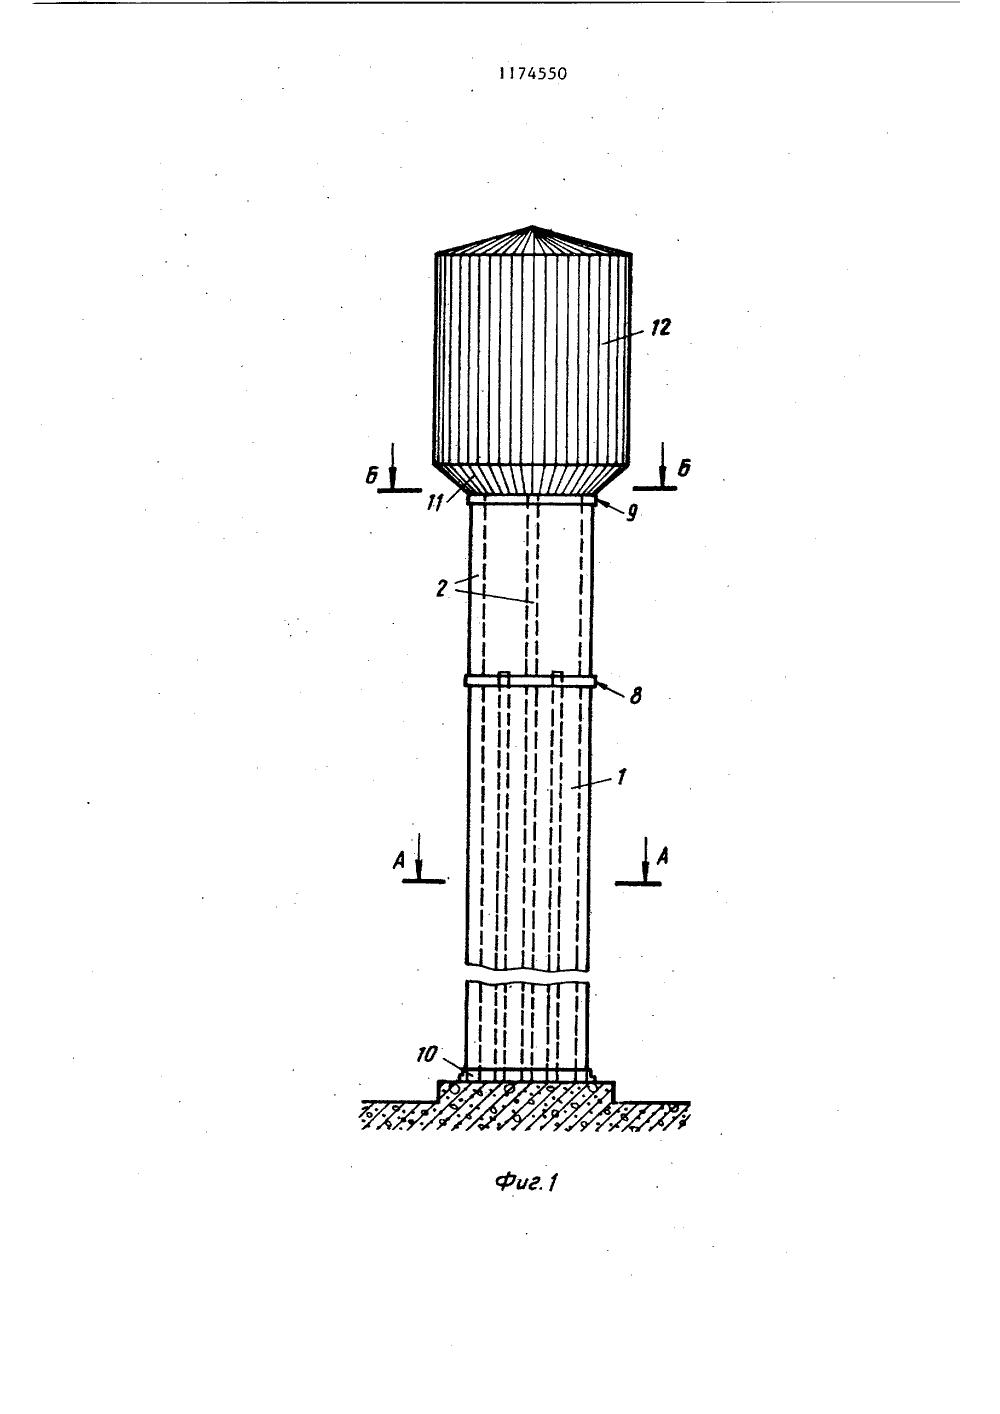 Водонапорная башня конструкция обвязка трубопровода